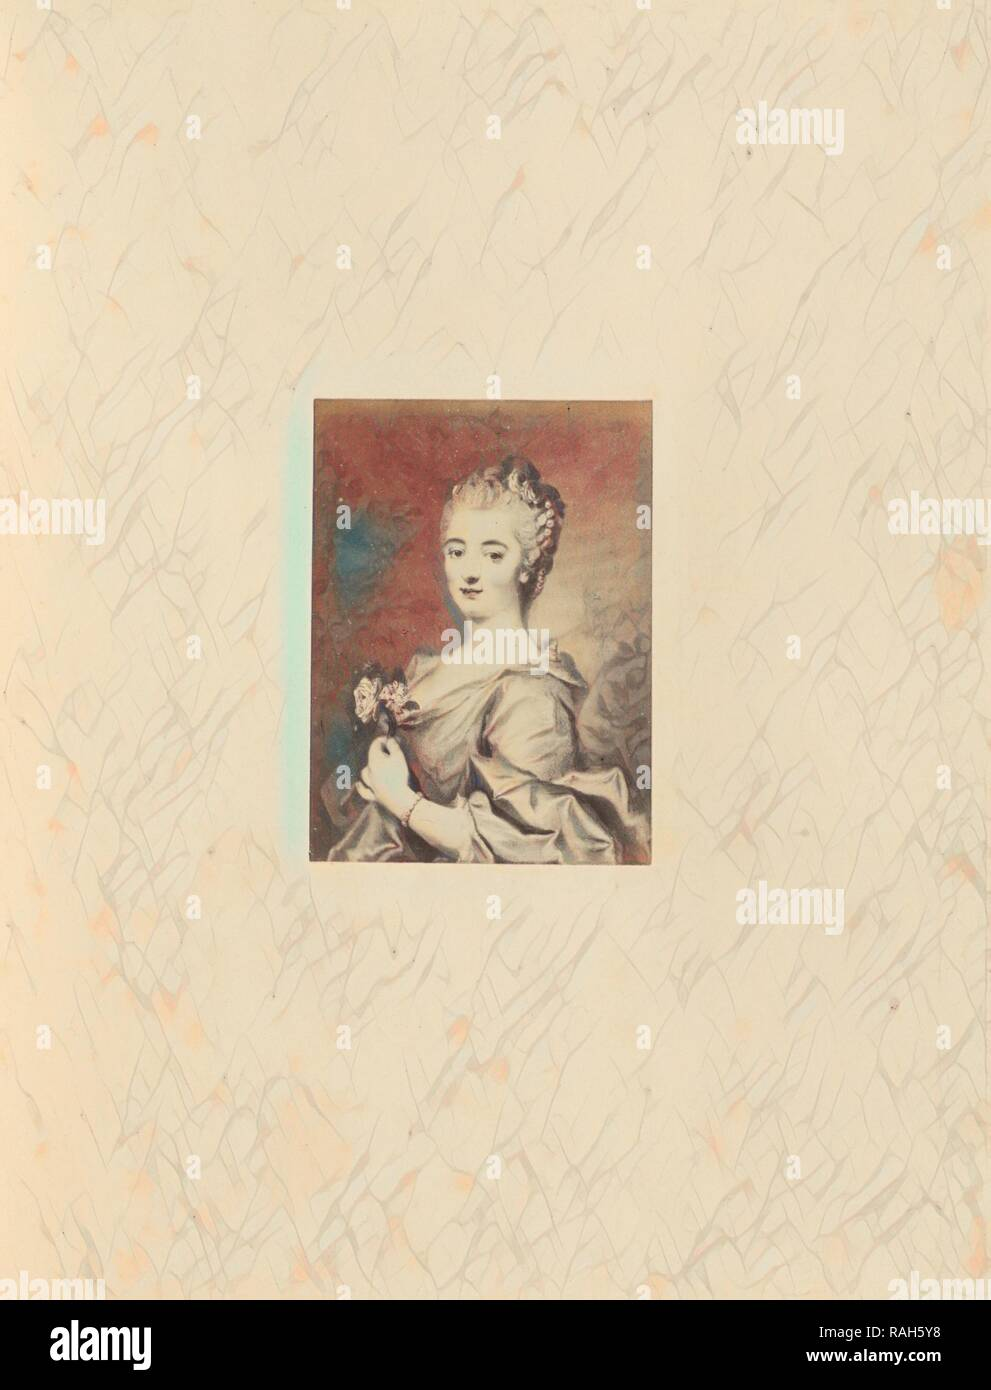 Madame du Barry, Charles Thurston Thompson (English, 1816 - 1868), London, England, 1865, Albumen silver print reimagined - Stock Image